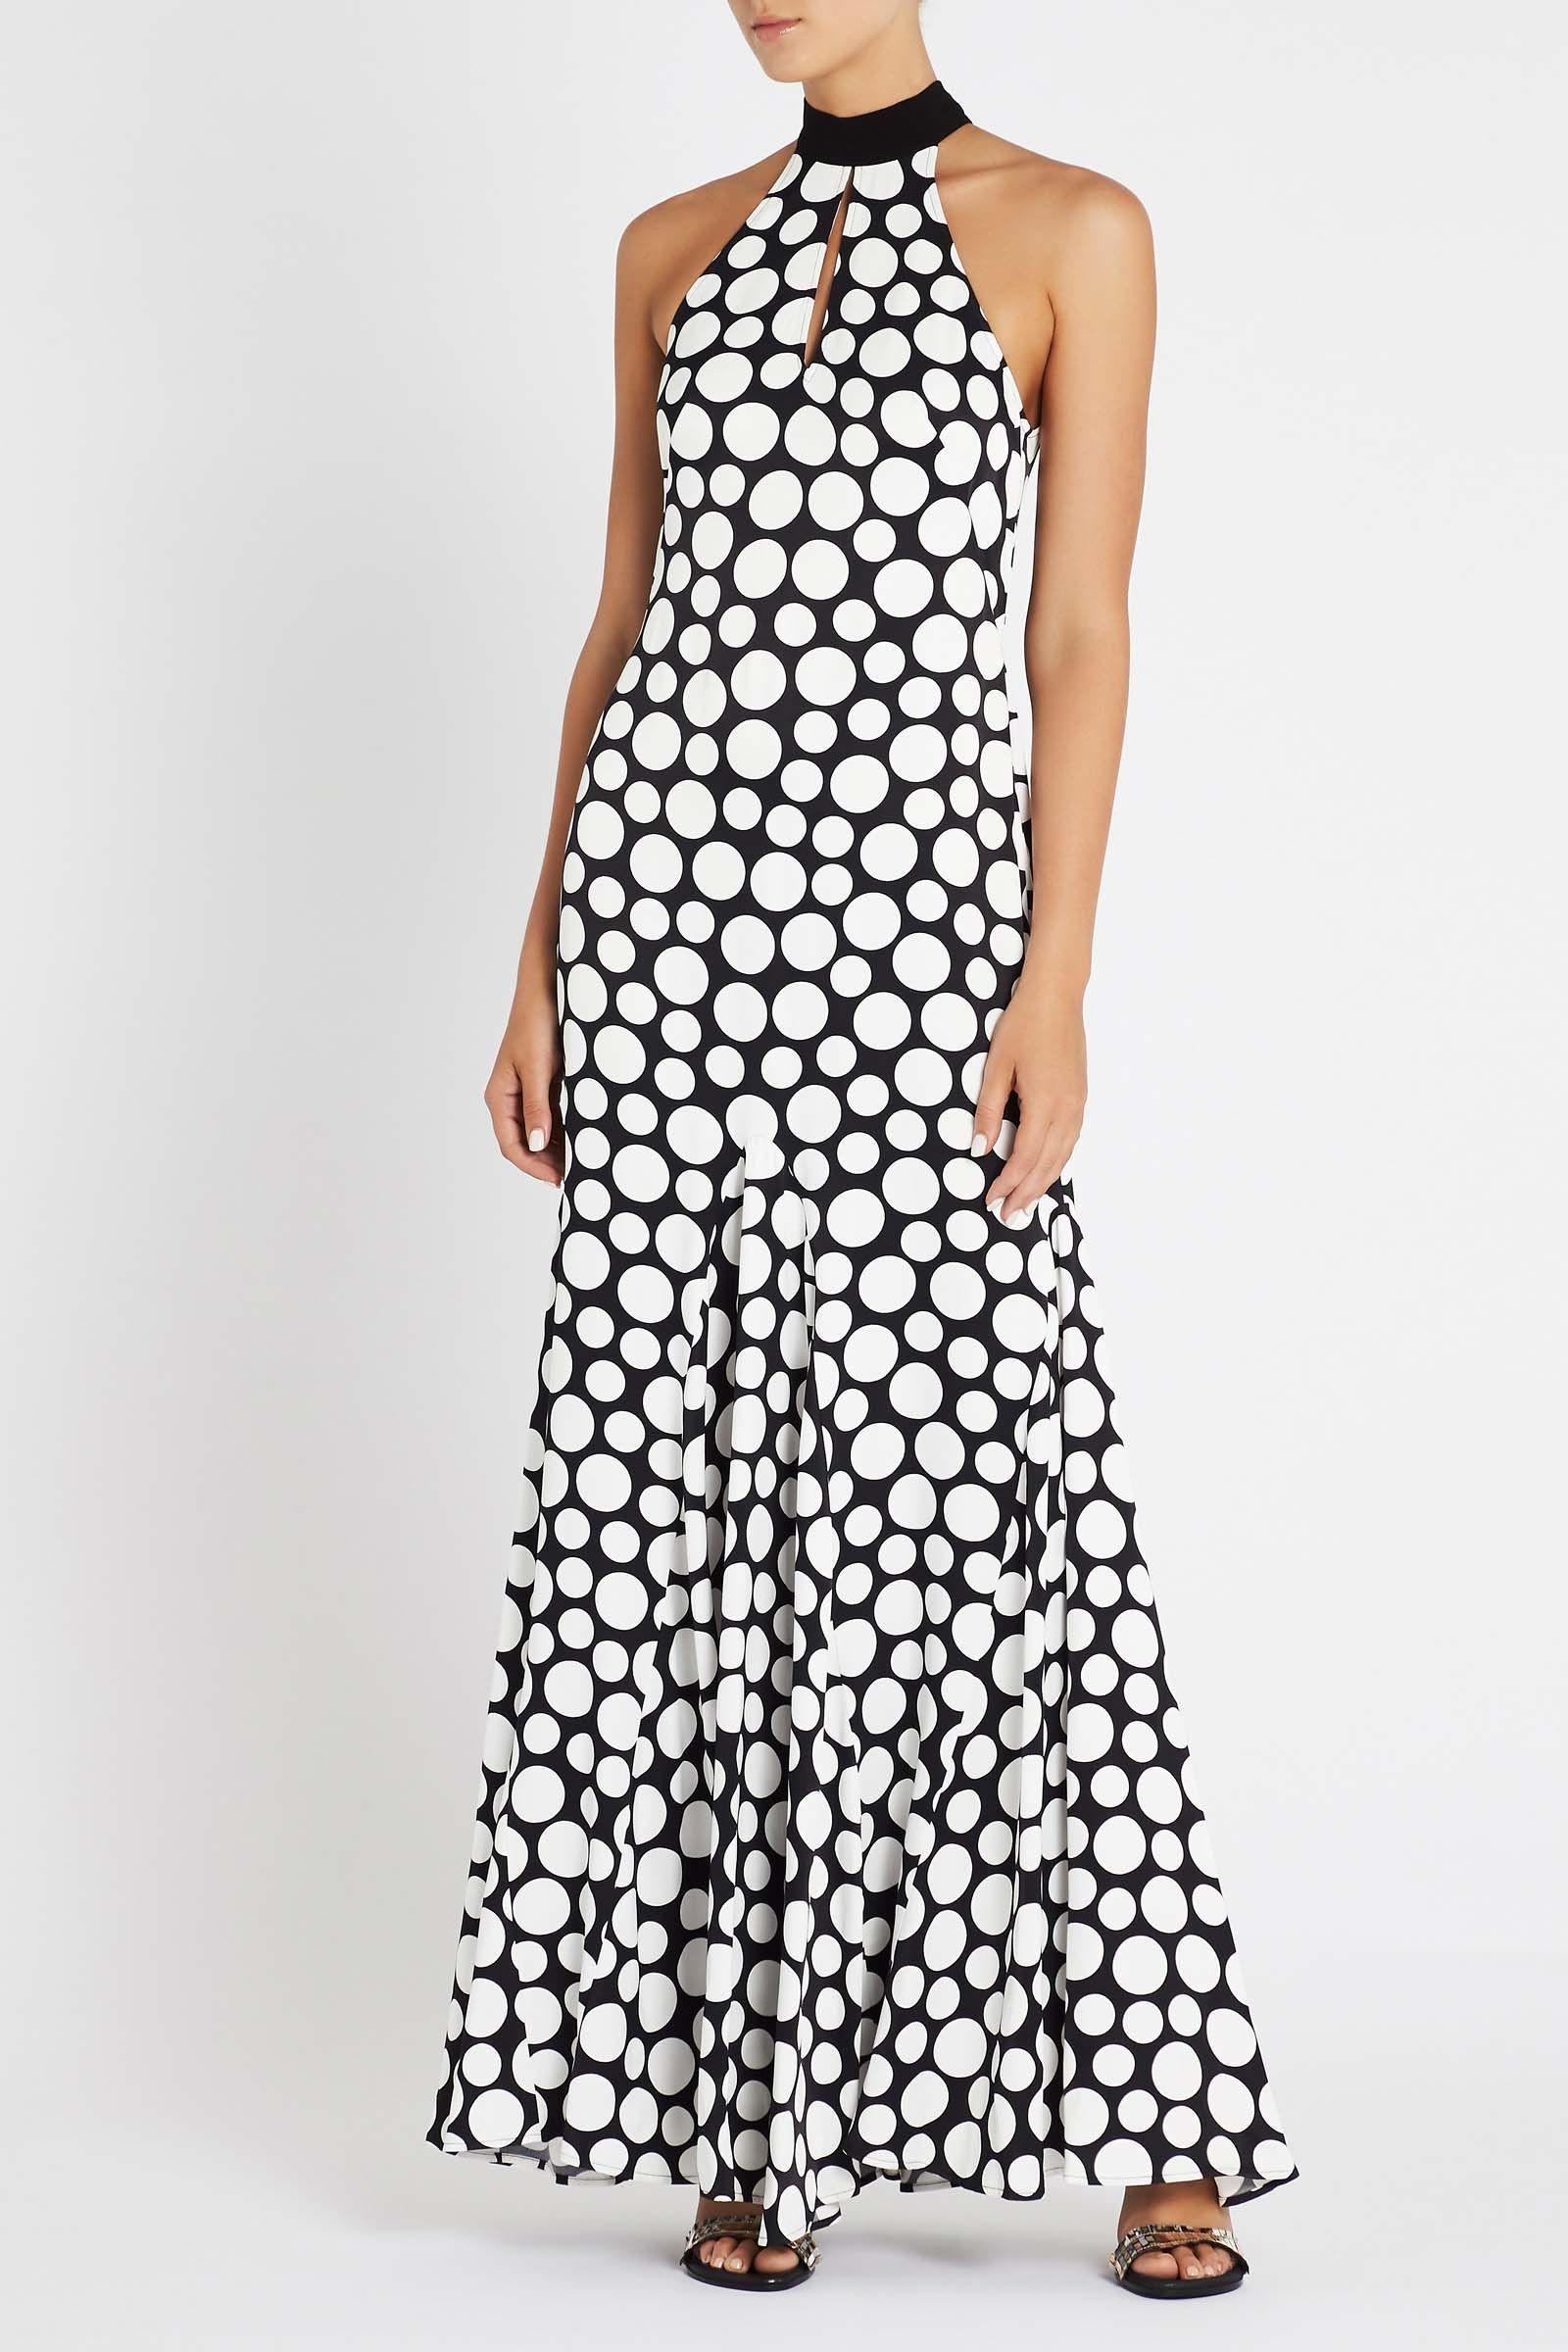 On Point Dress Flared Maxi Spot Dress Sassandbide Sass Bide Australia Shop Online With Afterpay Casual Dresses For Women Flare Maxi Skirt Dresses